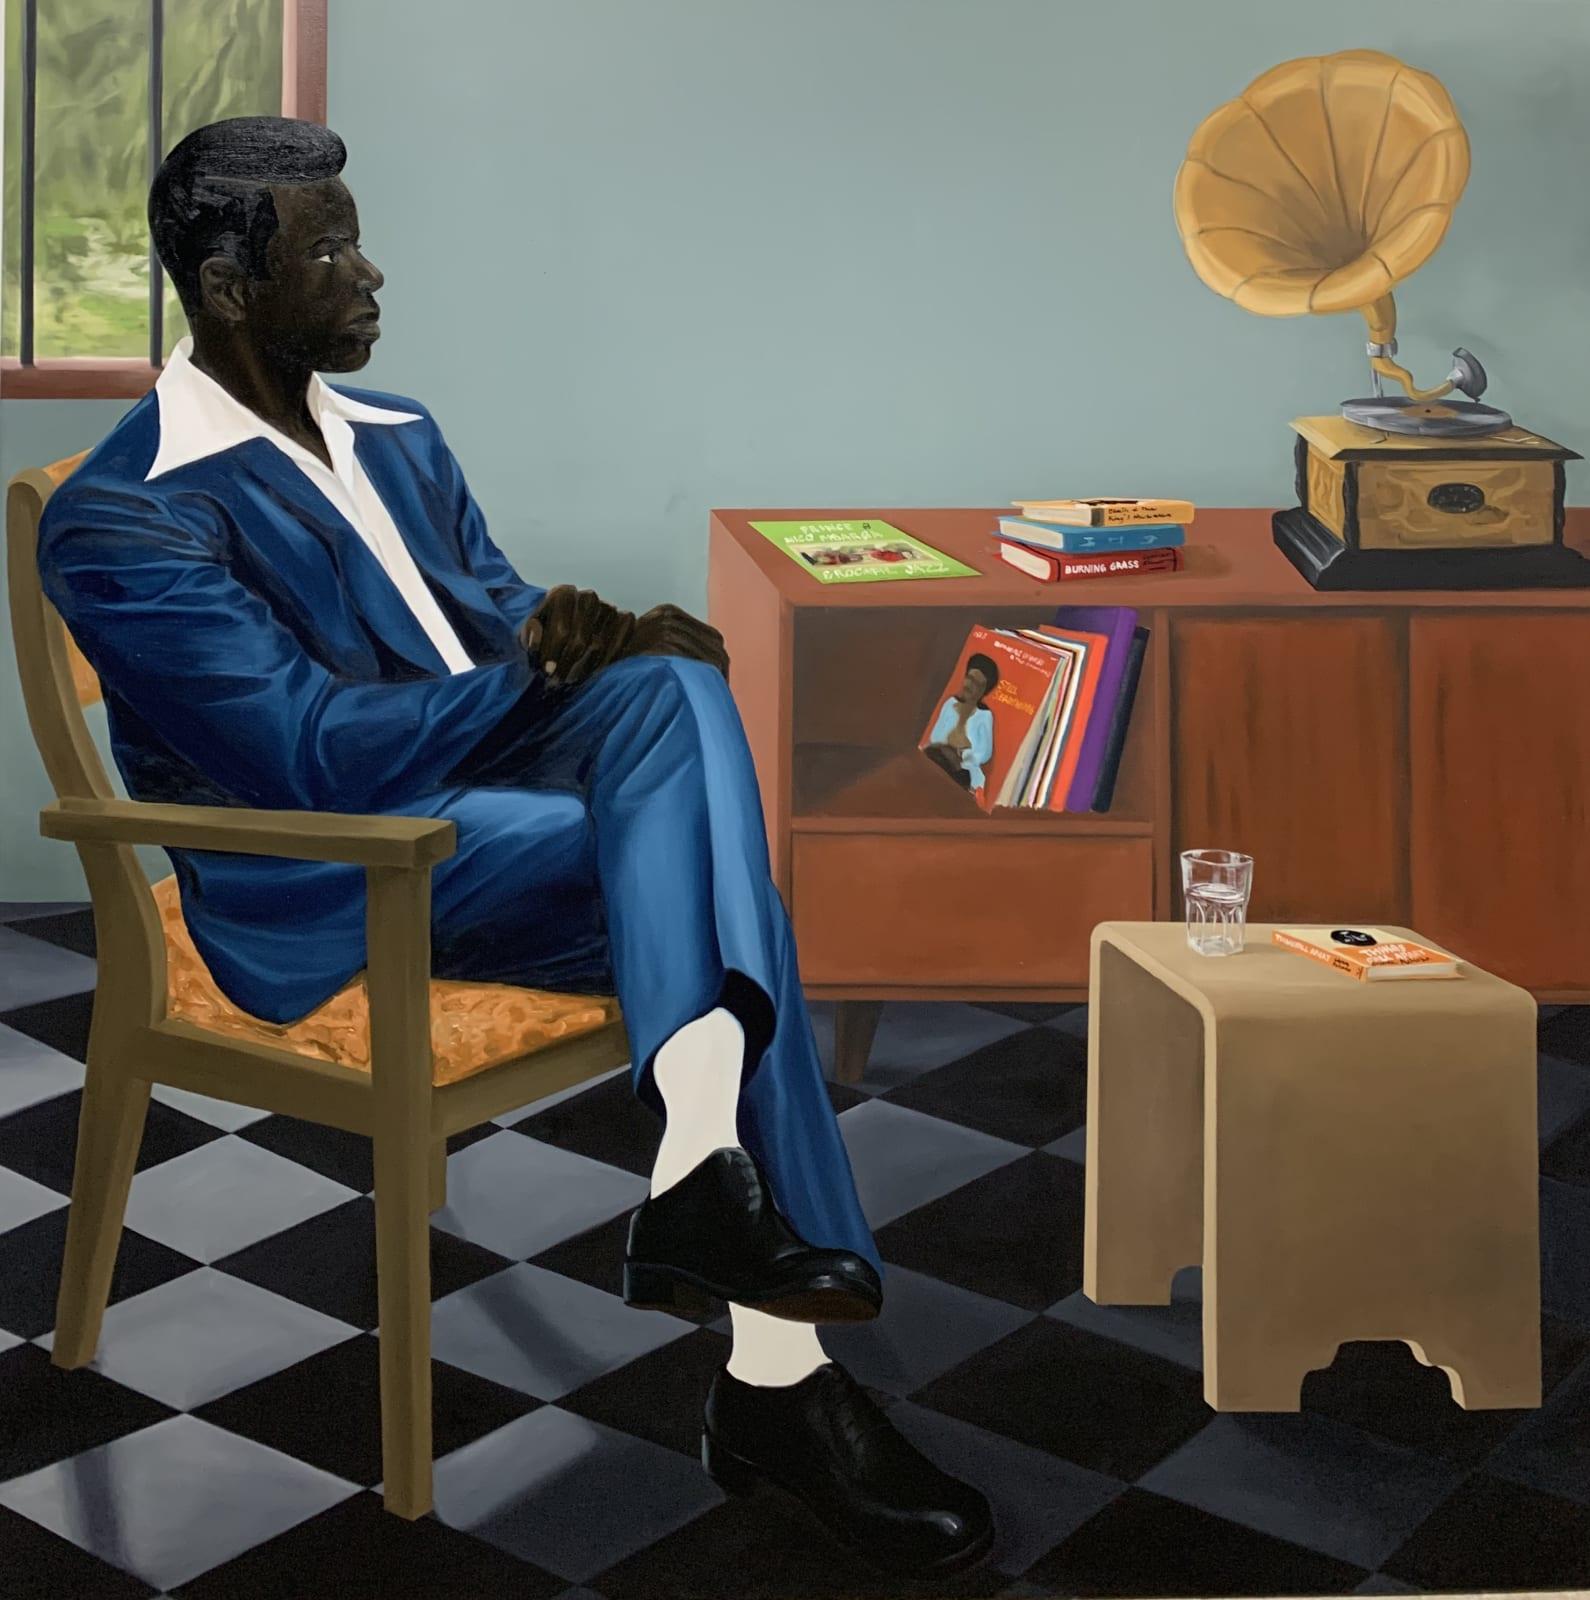 Peter Uka, Quiet Listening, 2020